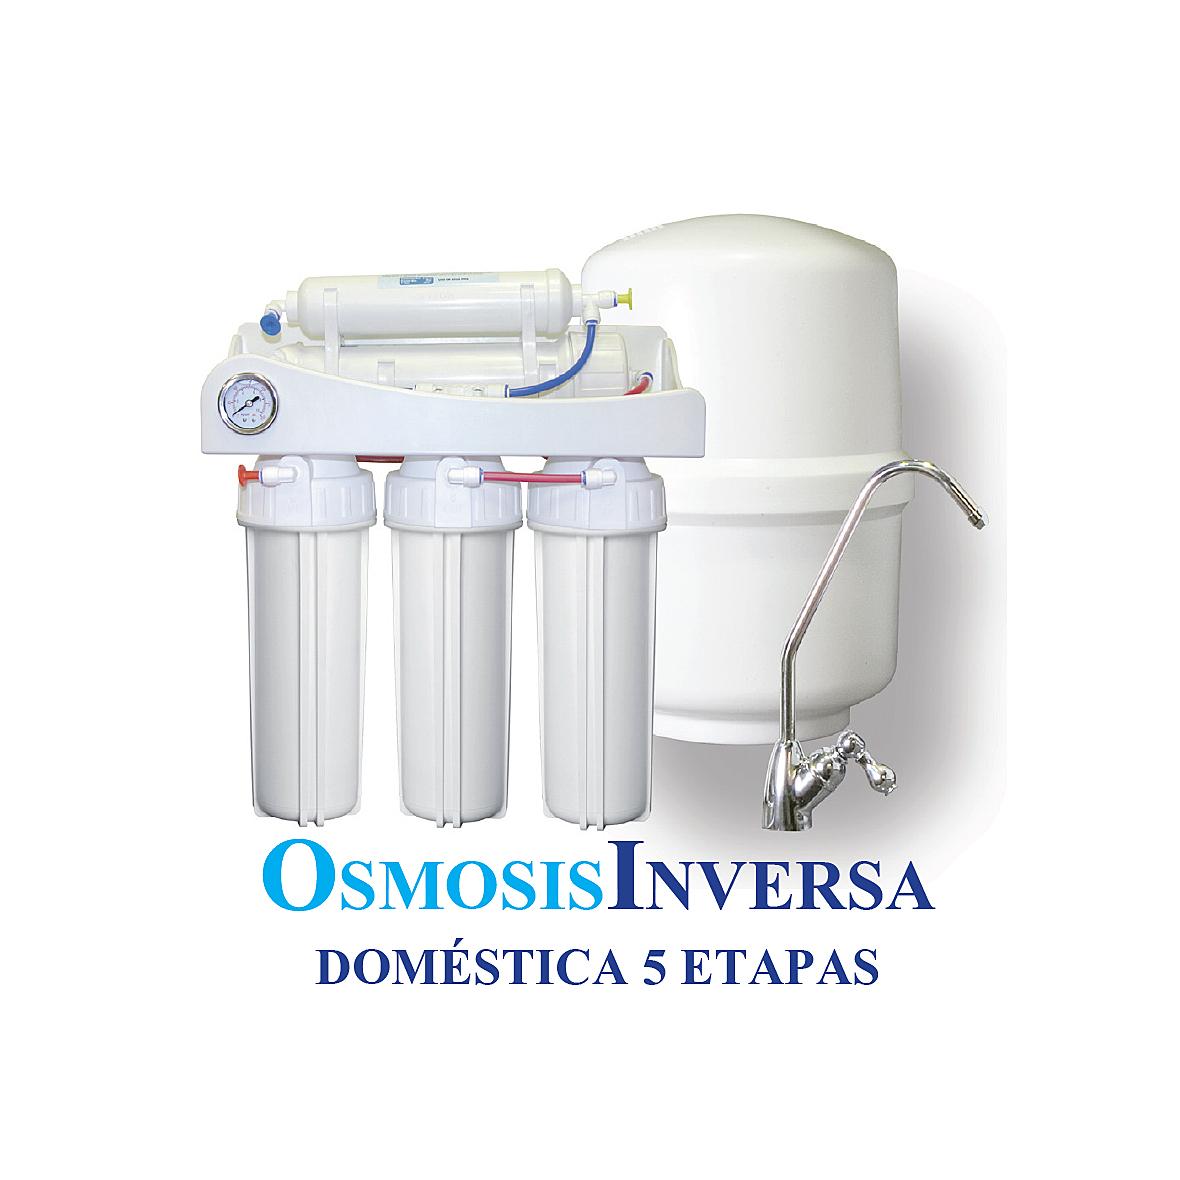 Osmosis inversa dom stica 5 etapas top uno agua low cost for Osmosis inversa domestica